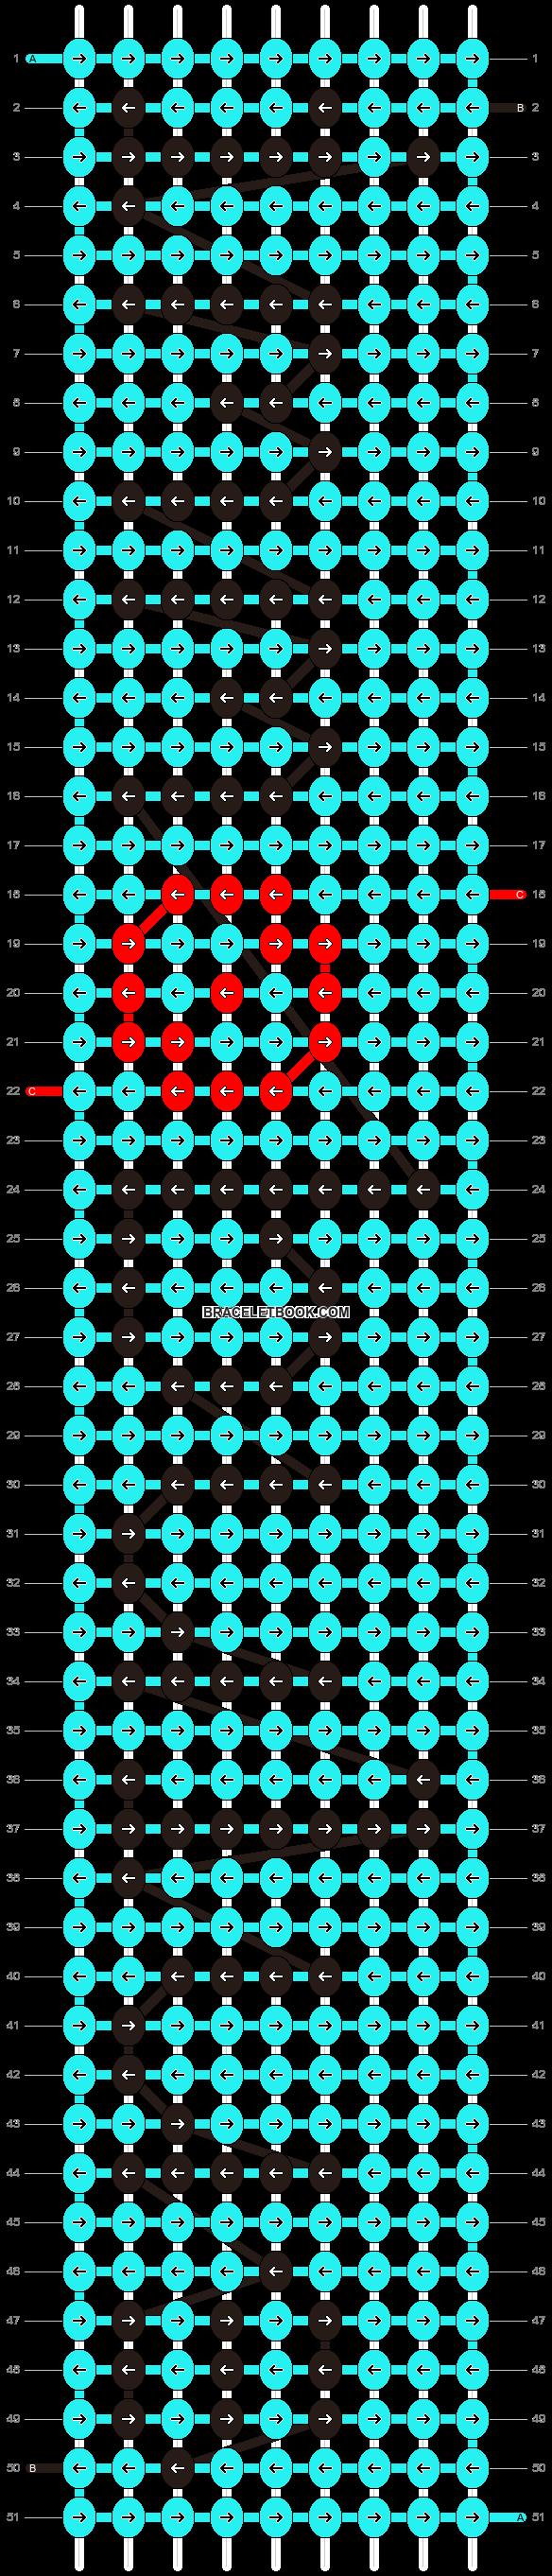 Alpha pattern #6494 pattern